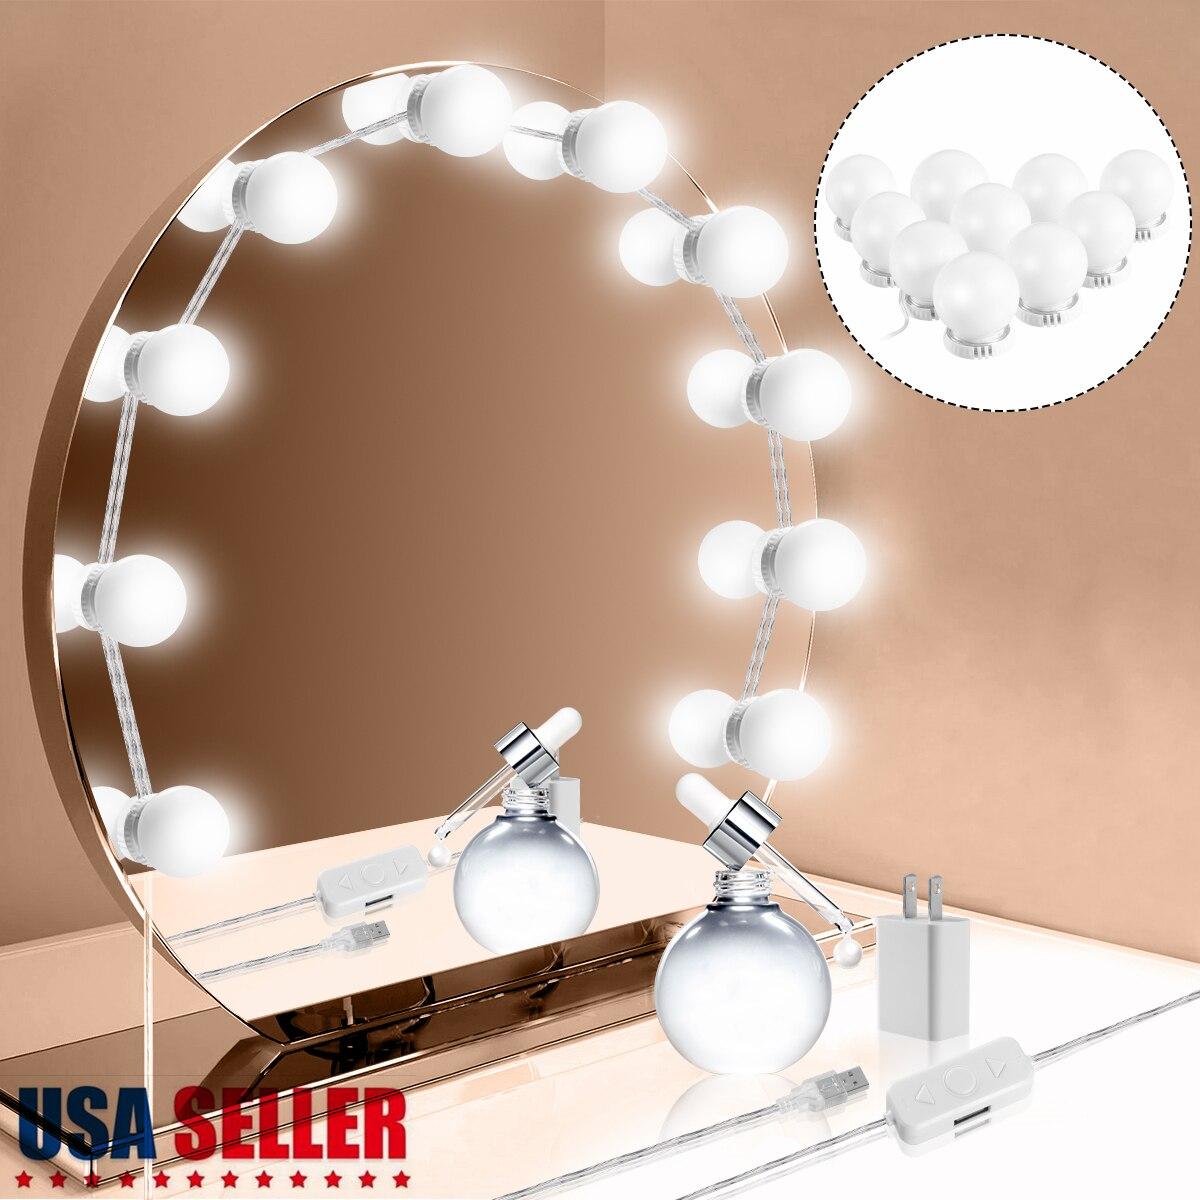 Luces DIY, cadena táctil, atenuador, 10 LEDs, Kit de luces de espejo de tocador suave regulable, adaptador de EE. UU. Para espejo de maquillaje profesional